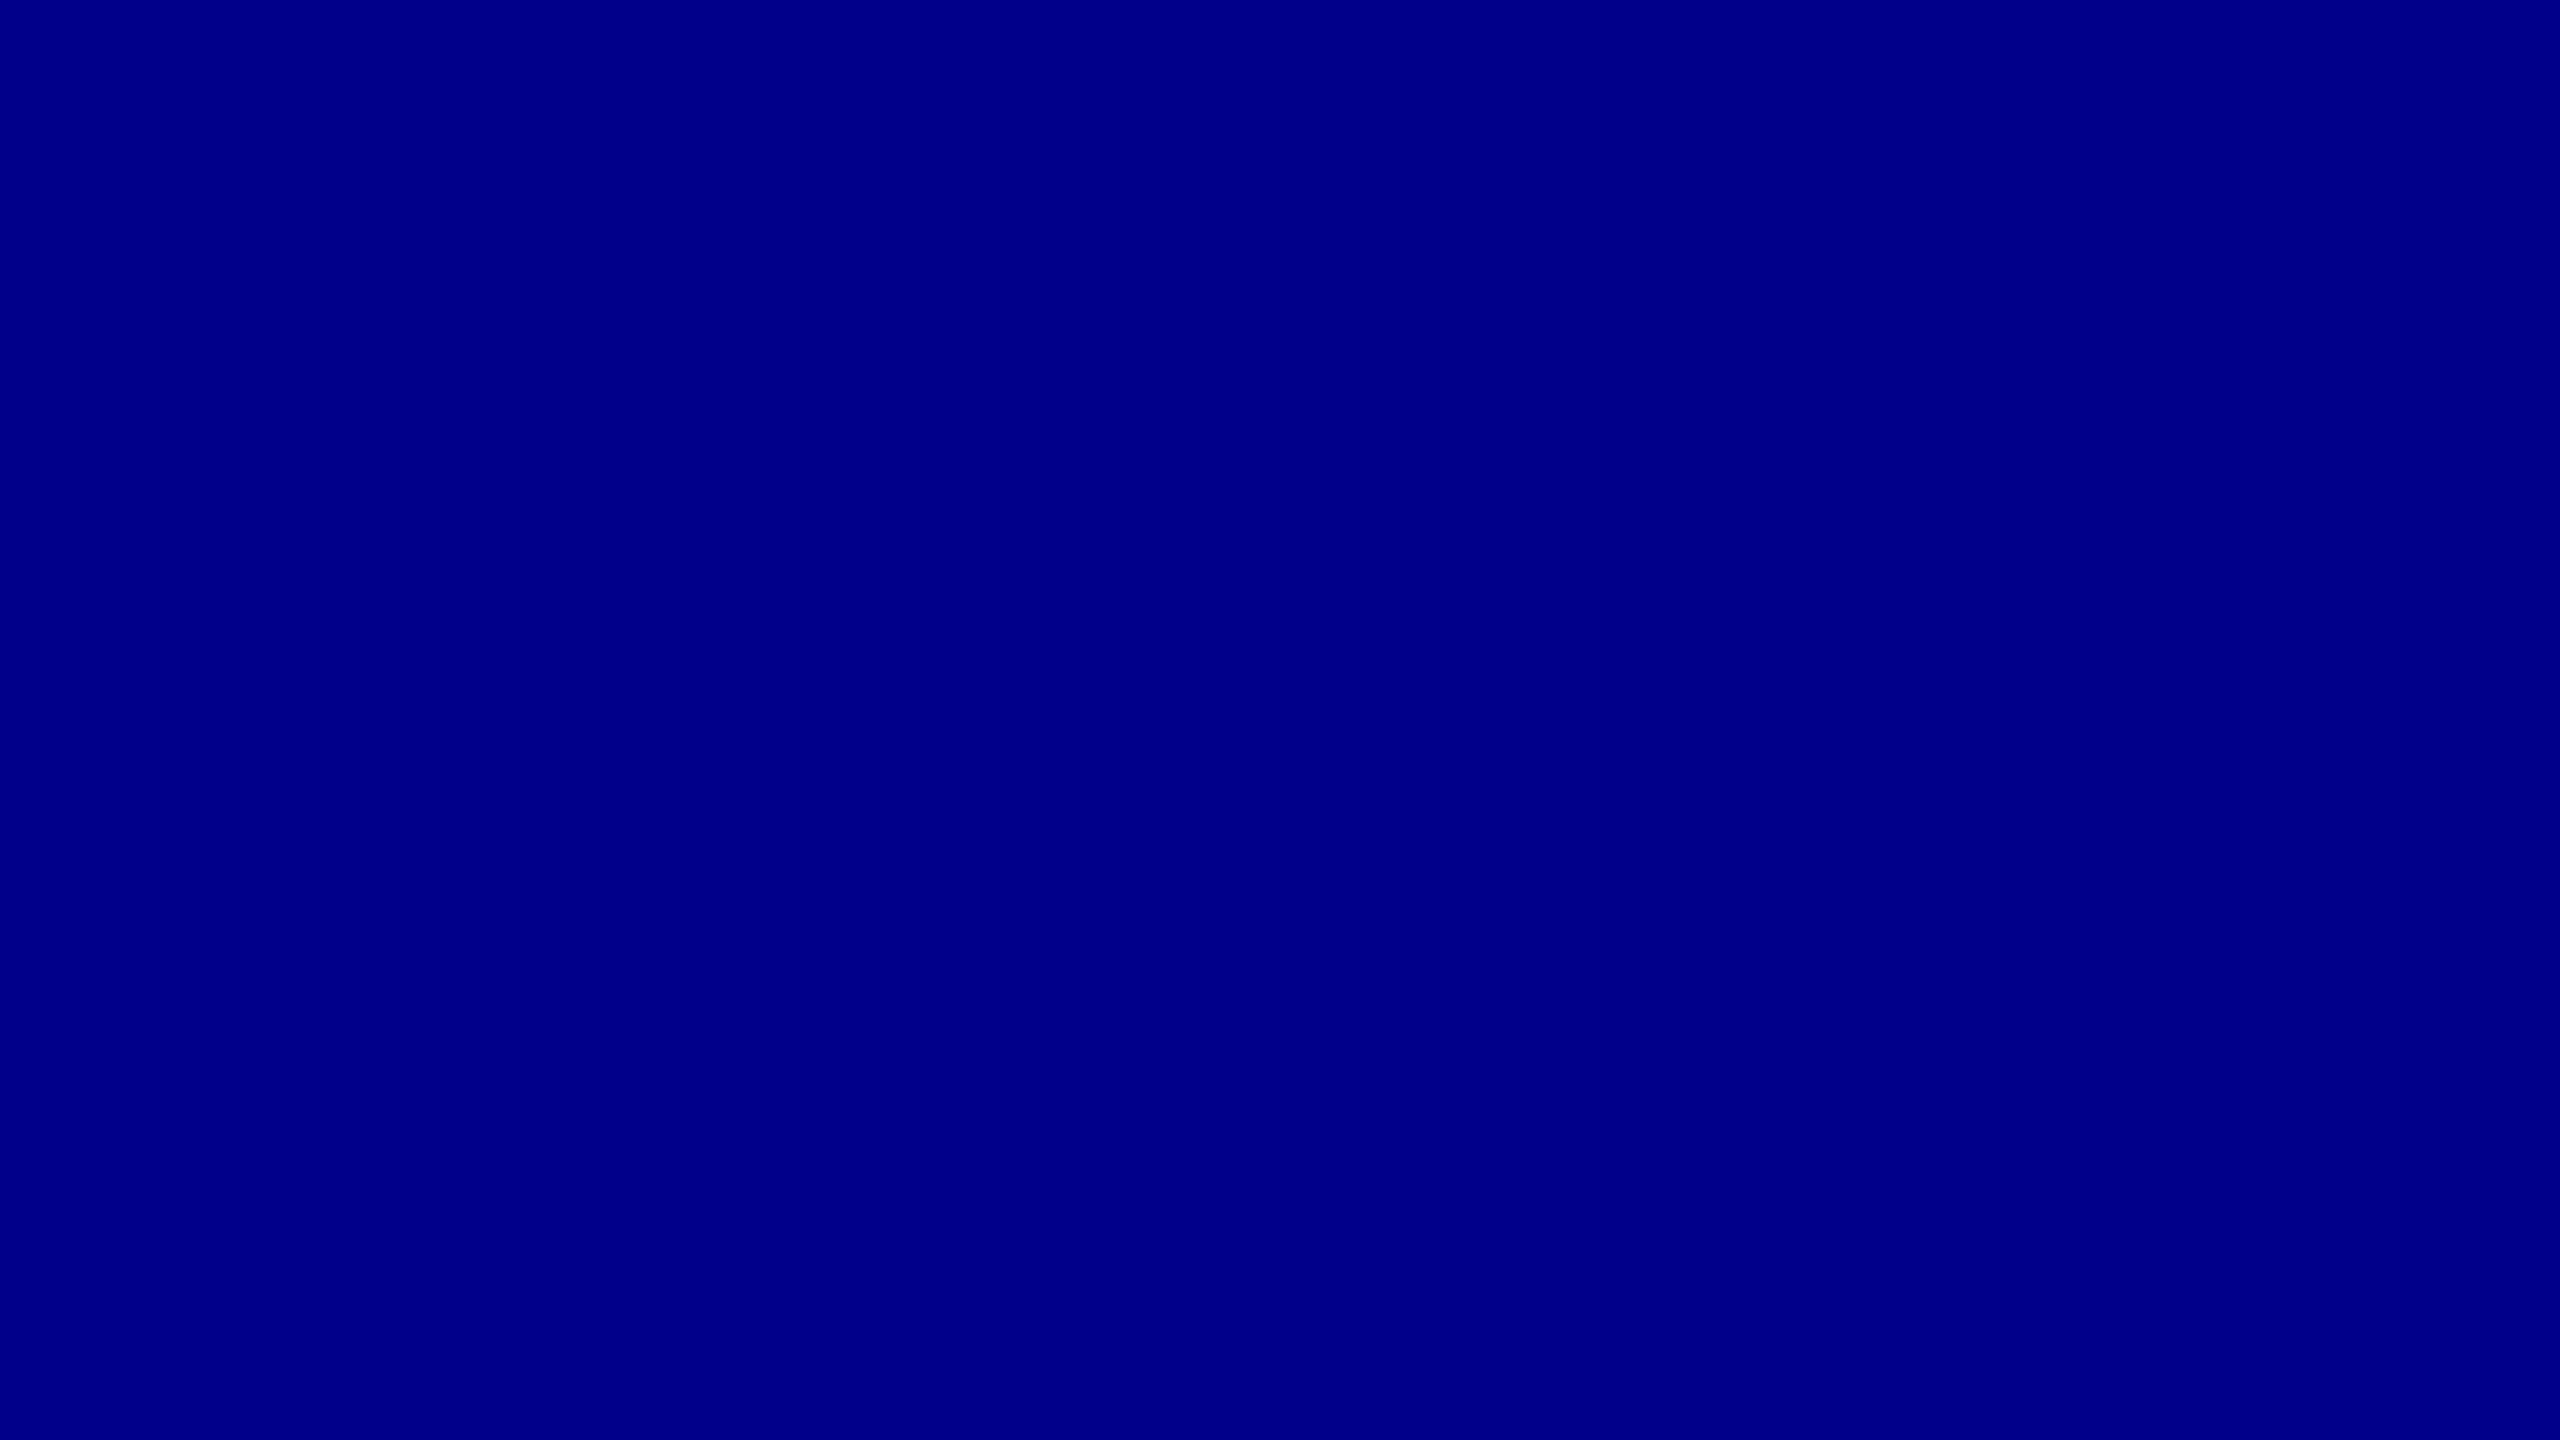 blue color background wallpaper wallpapersafari